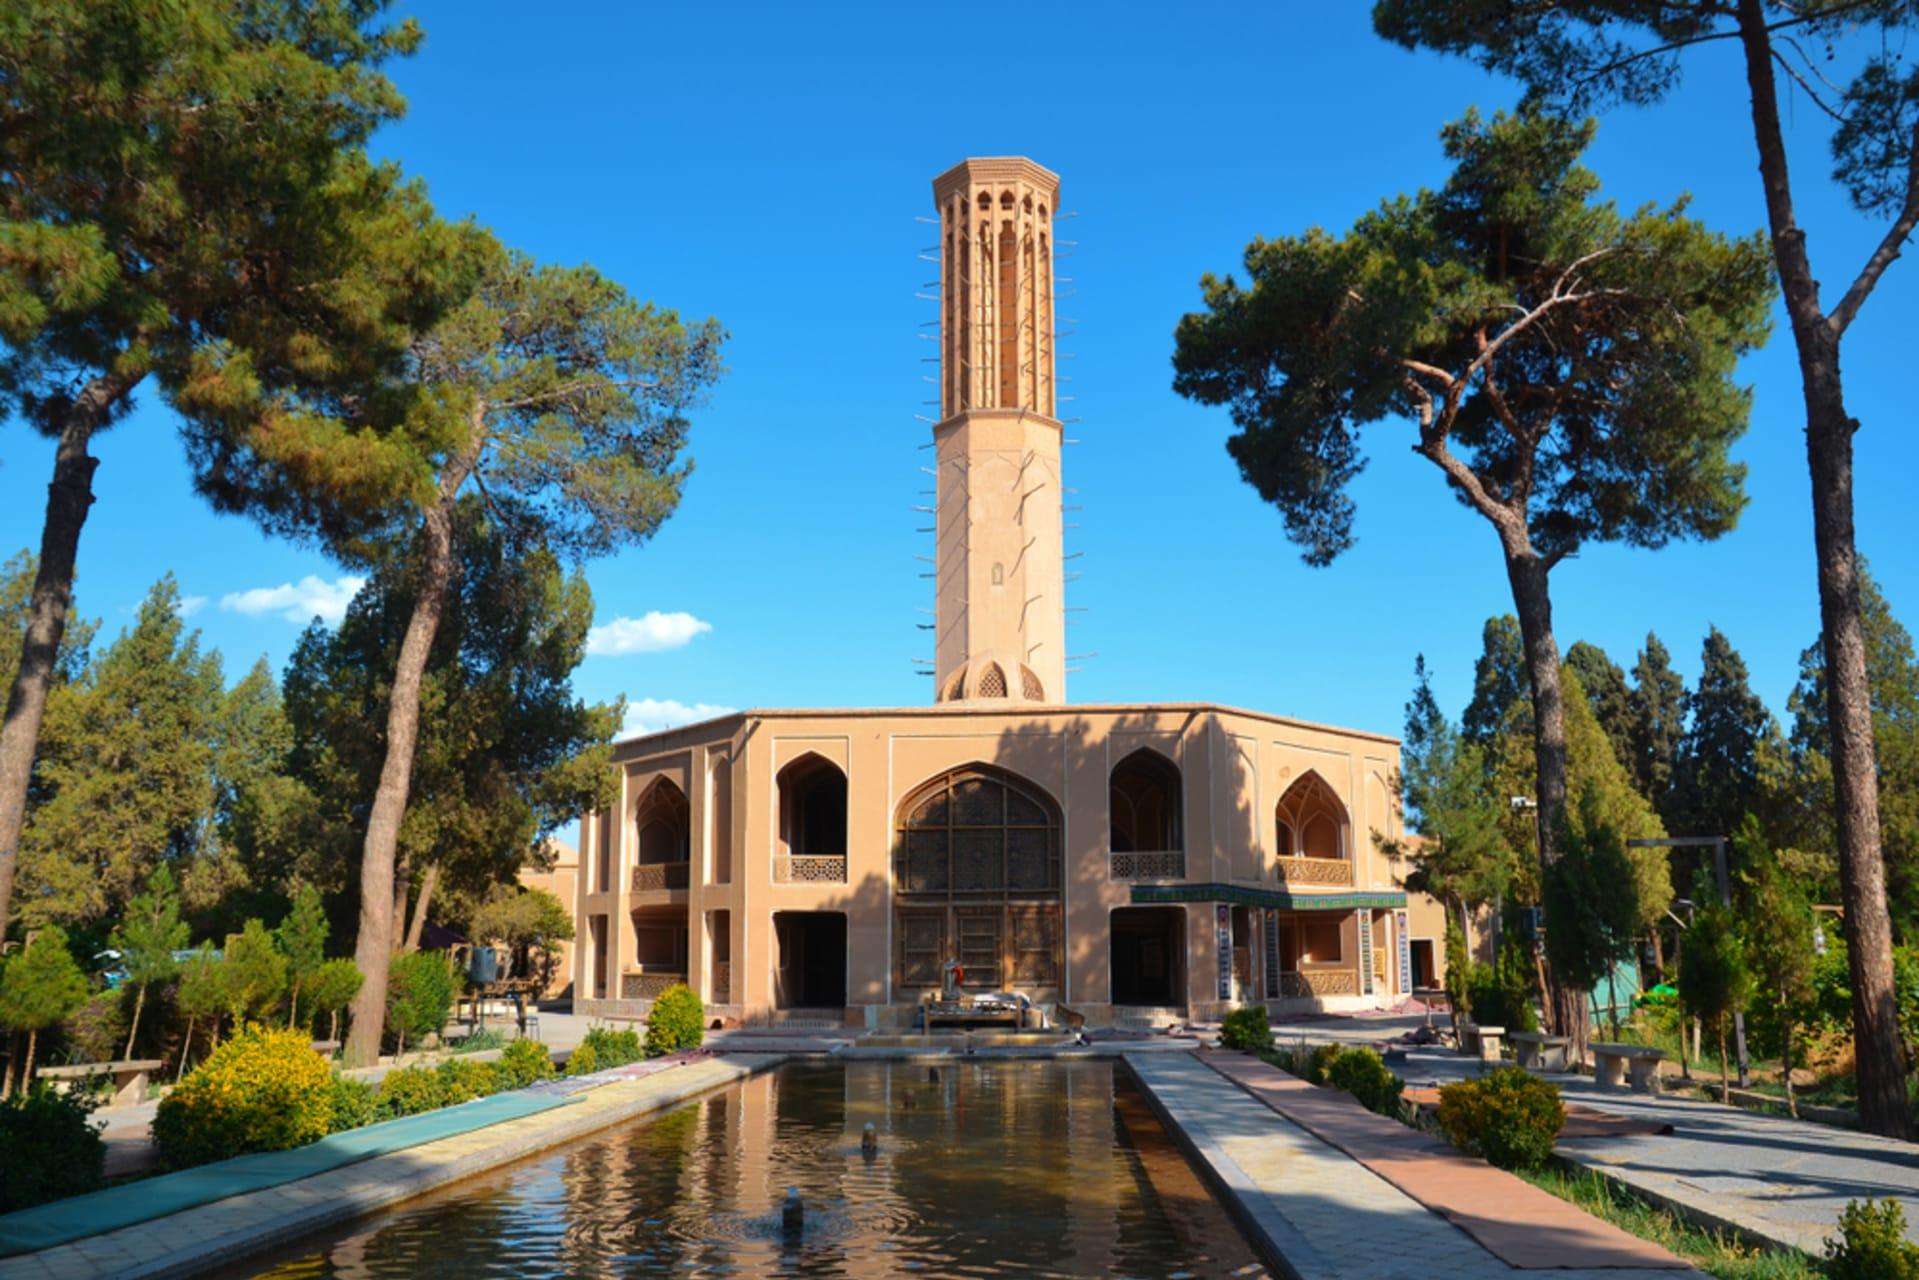 Yazd - Dowlat Abad: Loftiest Badgir of Iran